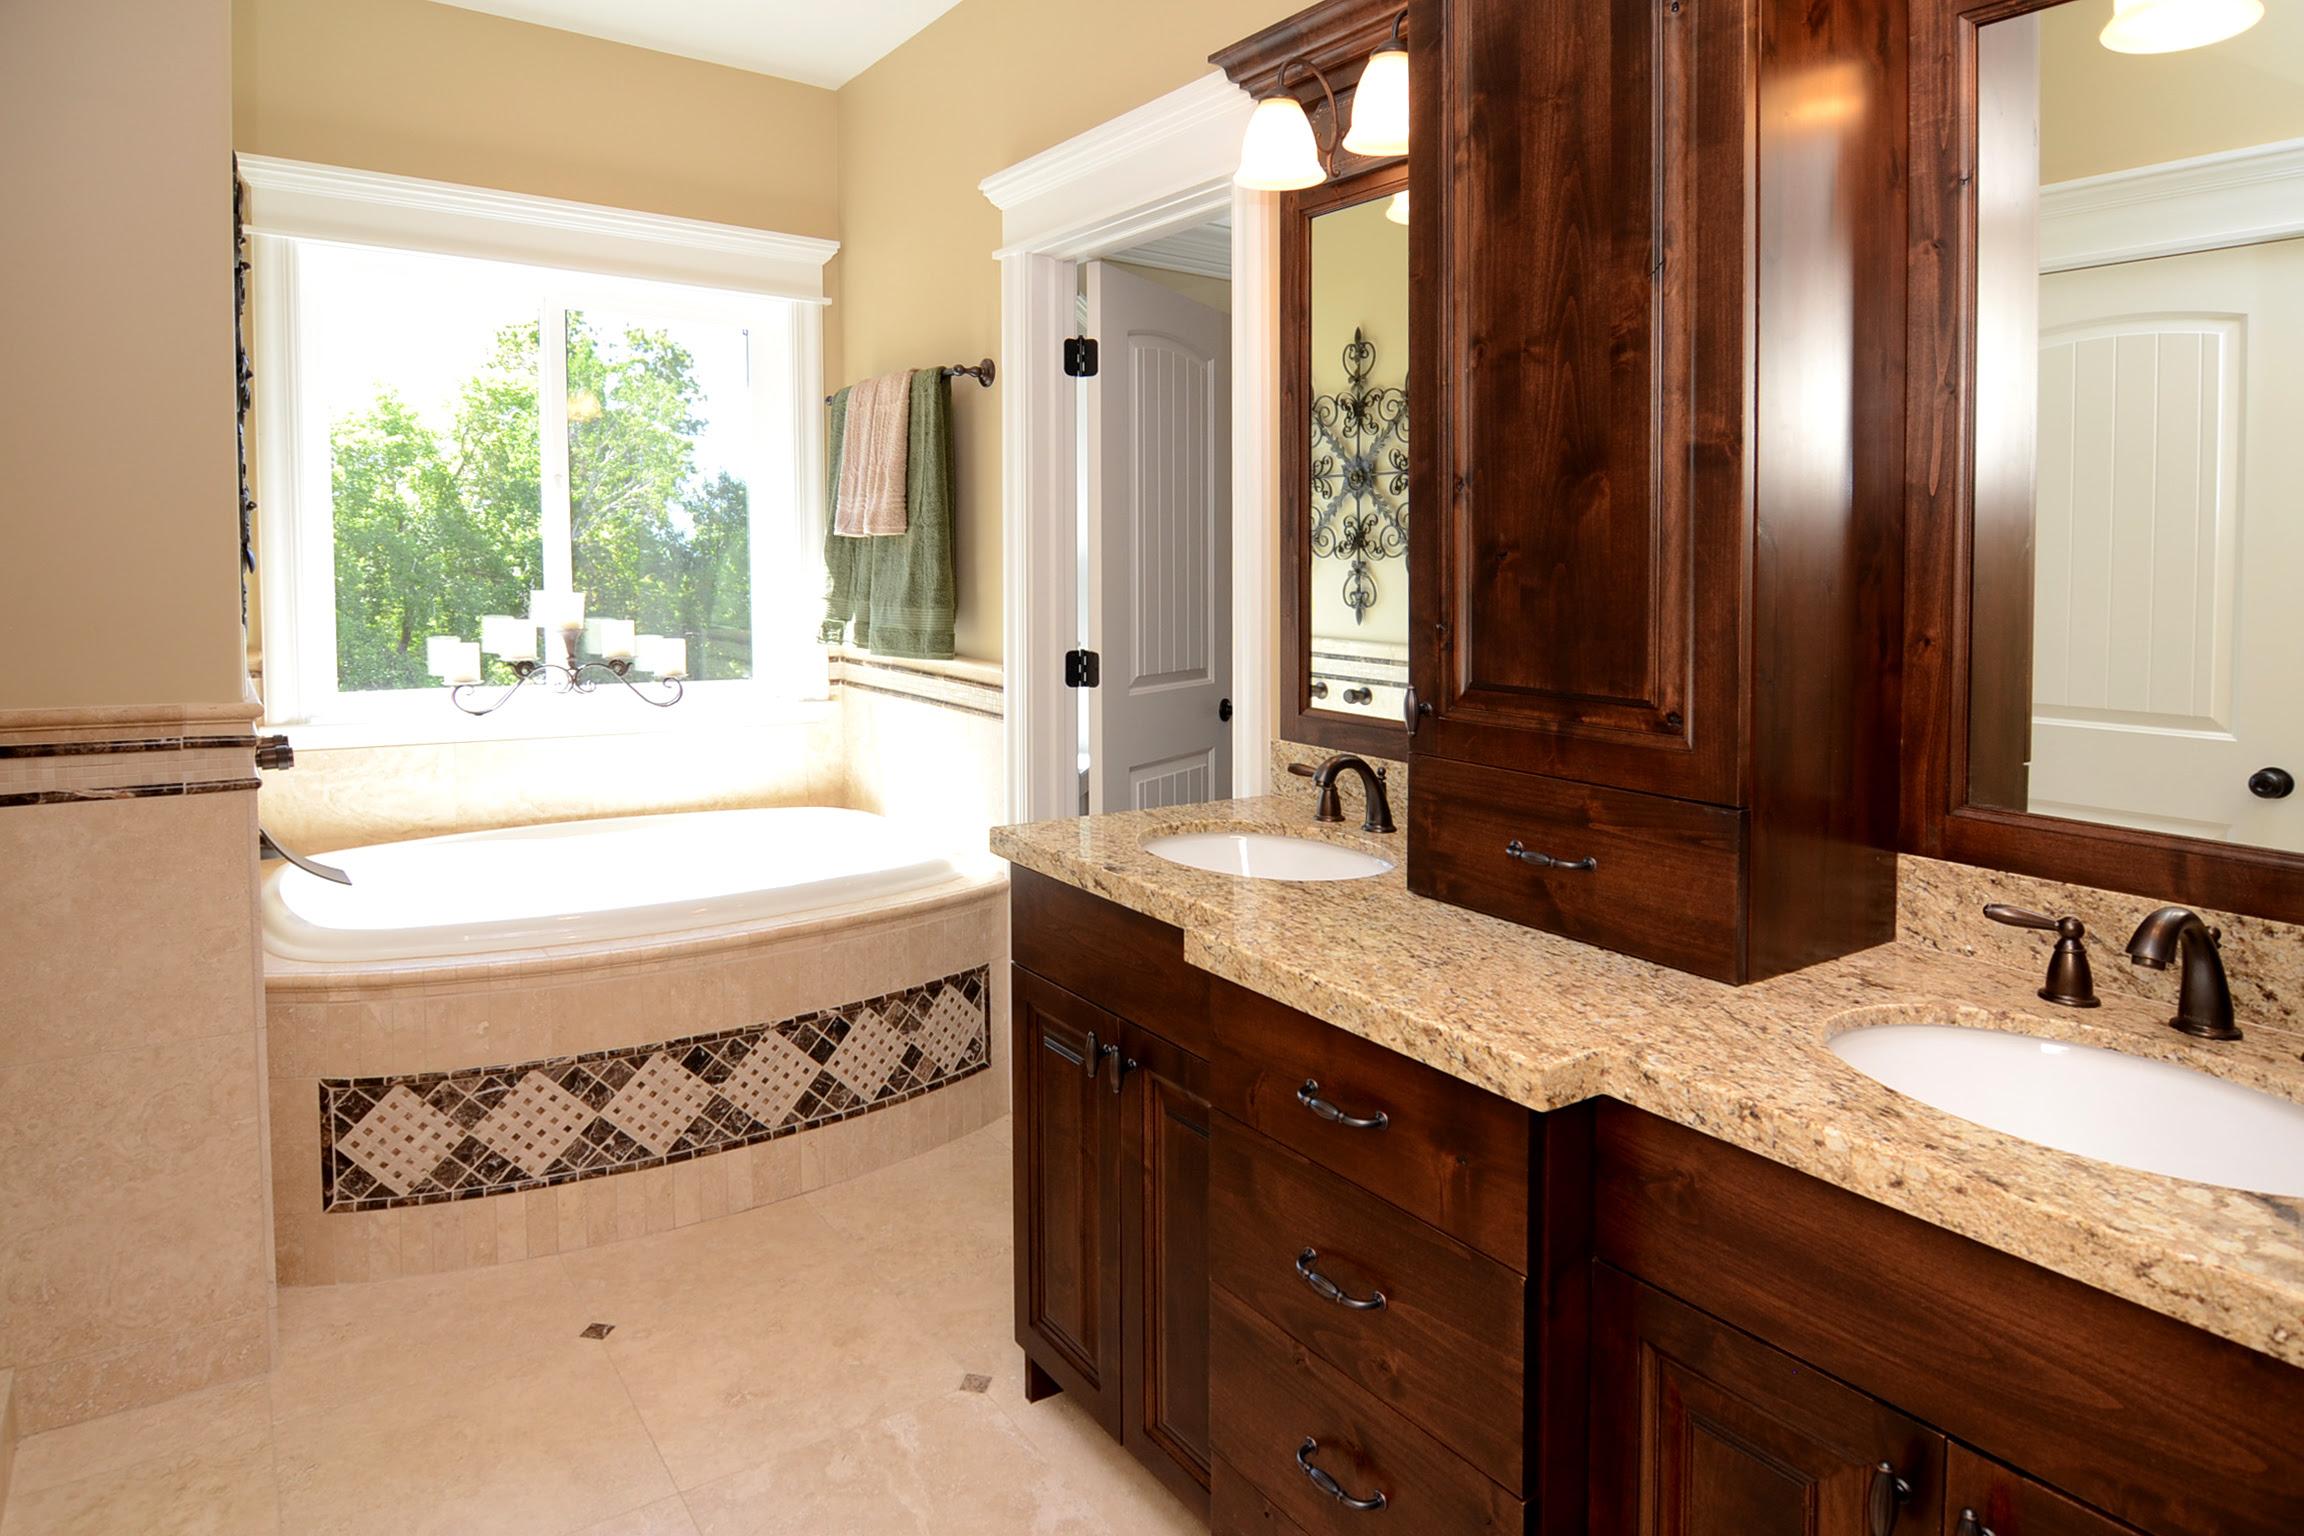 Bathroom Remodeling Fontourastone Construction General Contractors